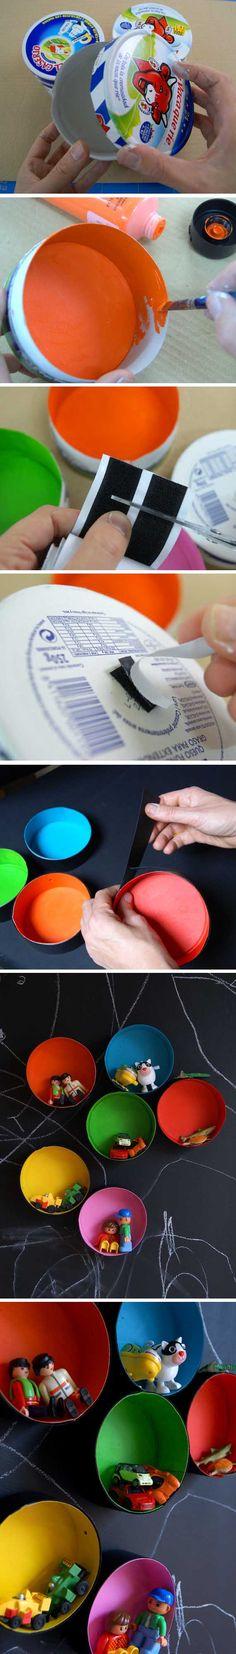 Klasversiering on pinterest butterfly decorations - Cajas de plastico para almacenar ...